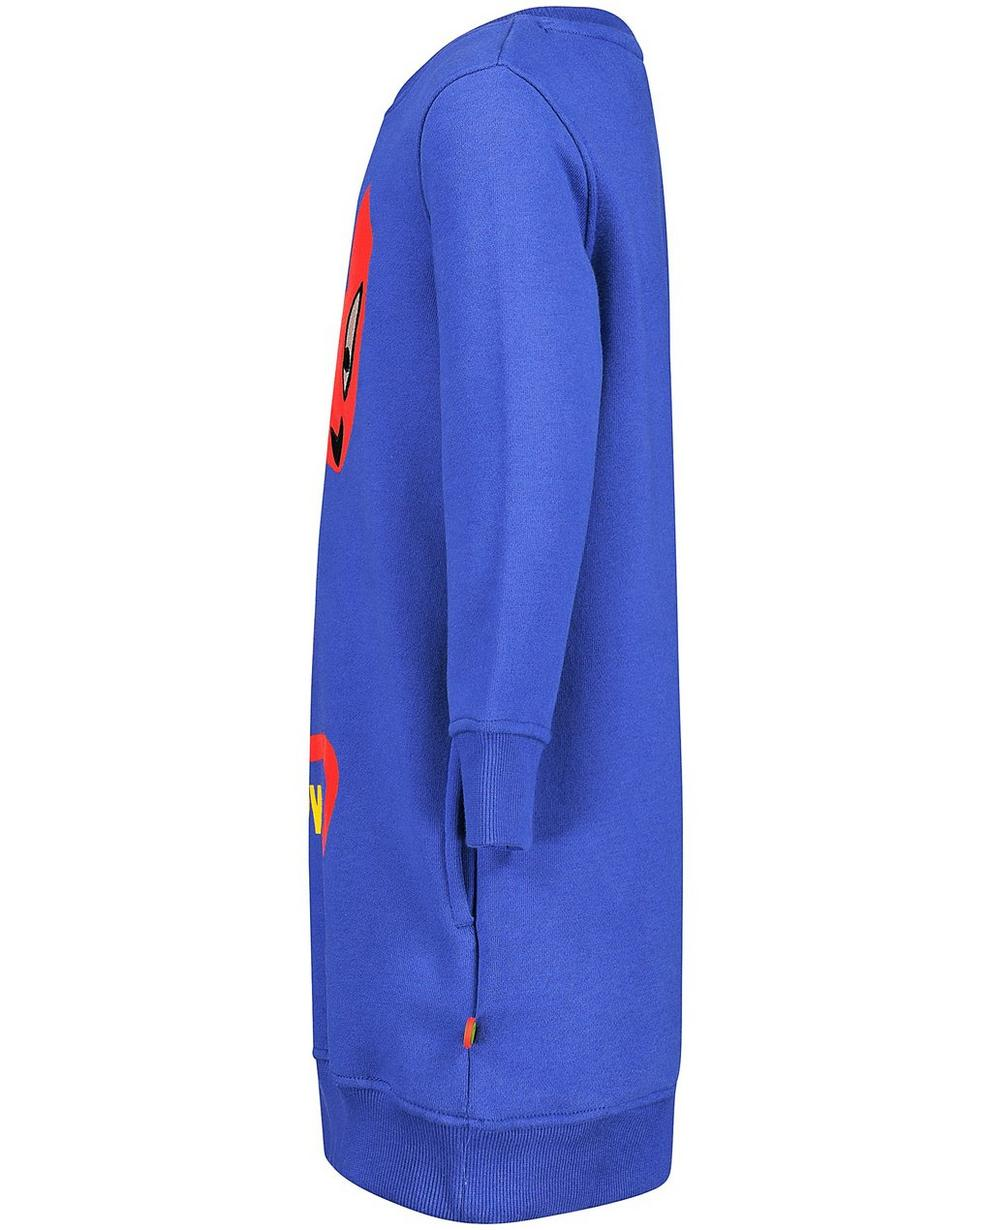 Robes - navy - Robe molletonnée